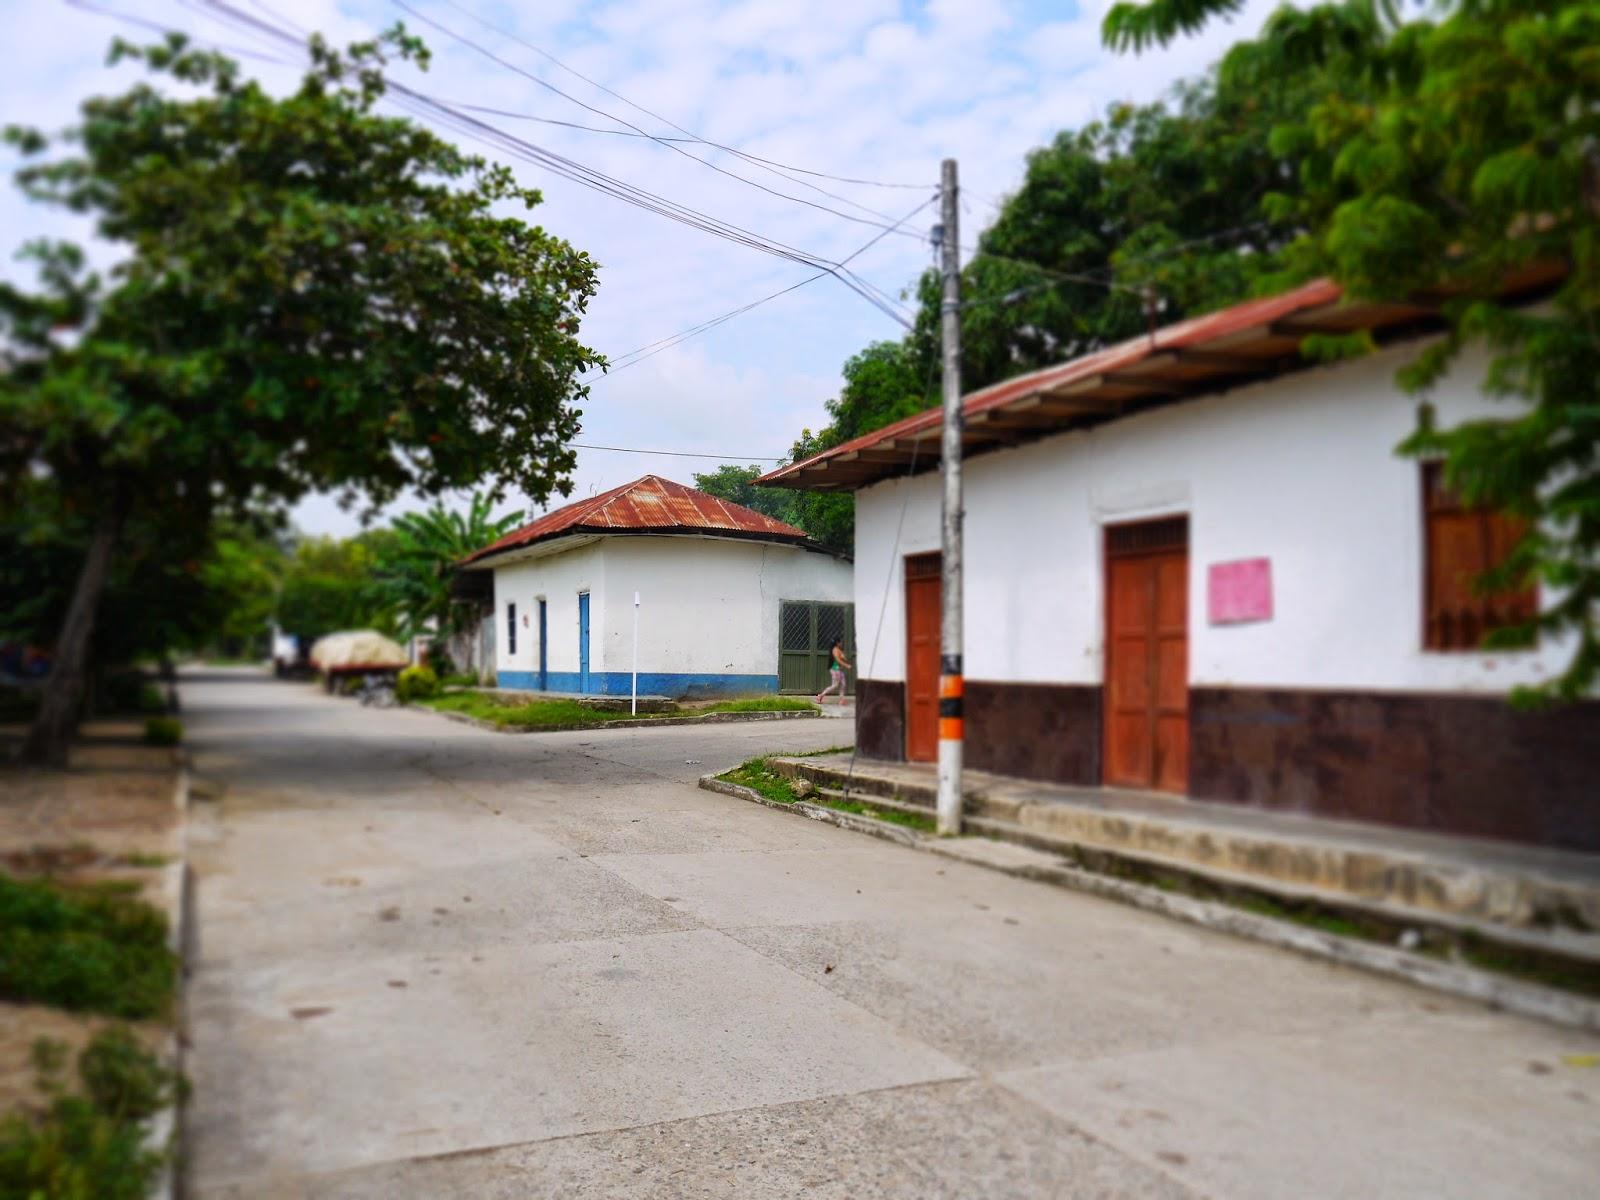 Casa de Antigua Valle de san juan tolima